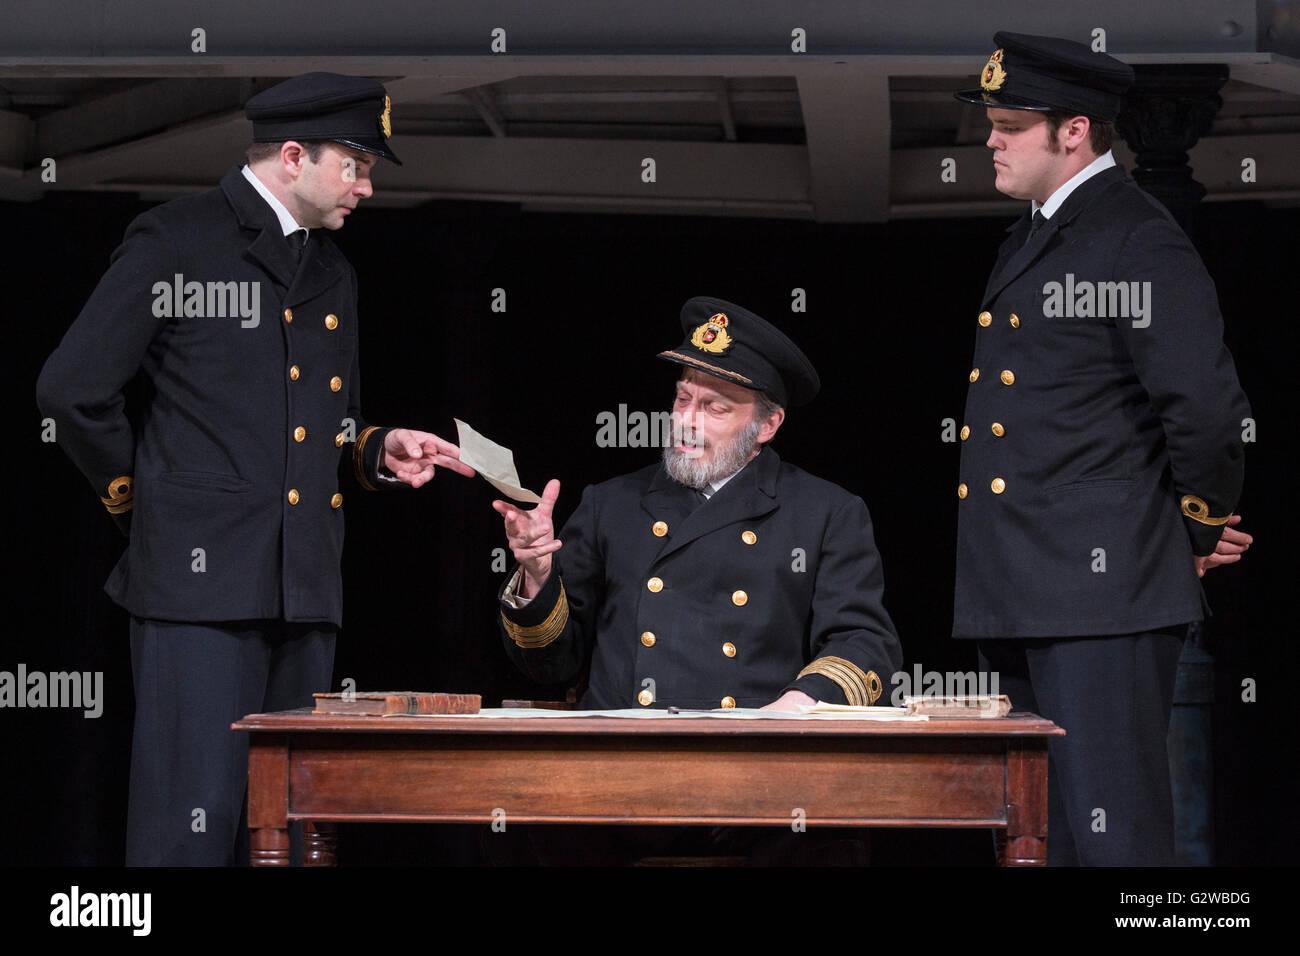 London, UK. 3rd June, 2016. L-R: Scott Cripps (Murdoch), Philip Rham (Captain Edwards) and Alistair Barron (Lightoller). - Stock Image